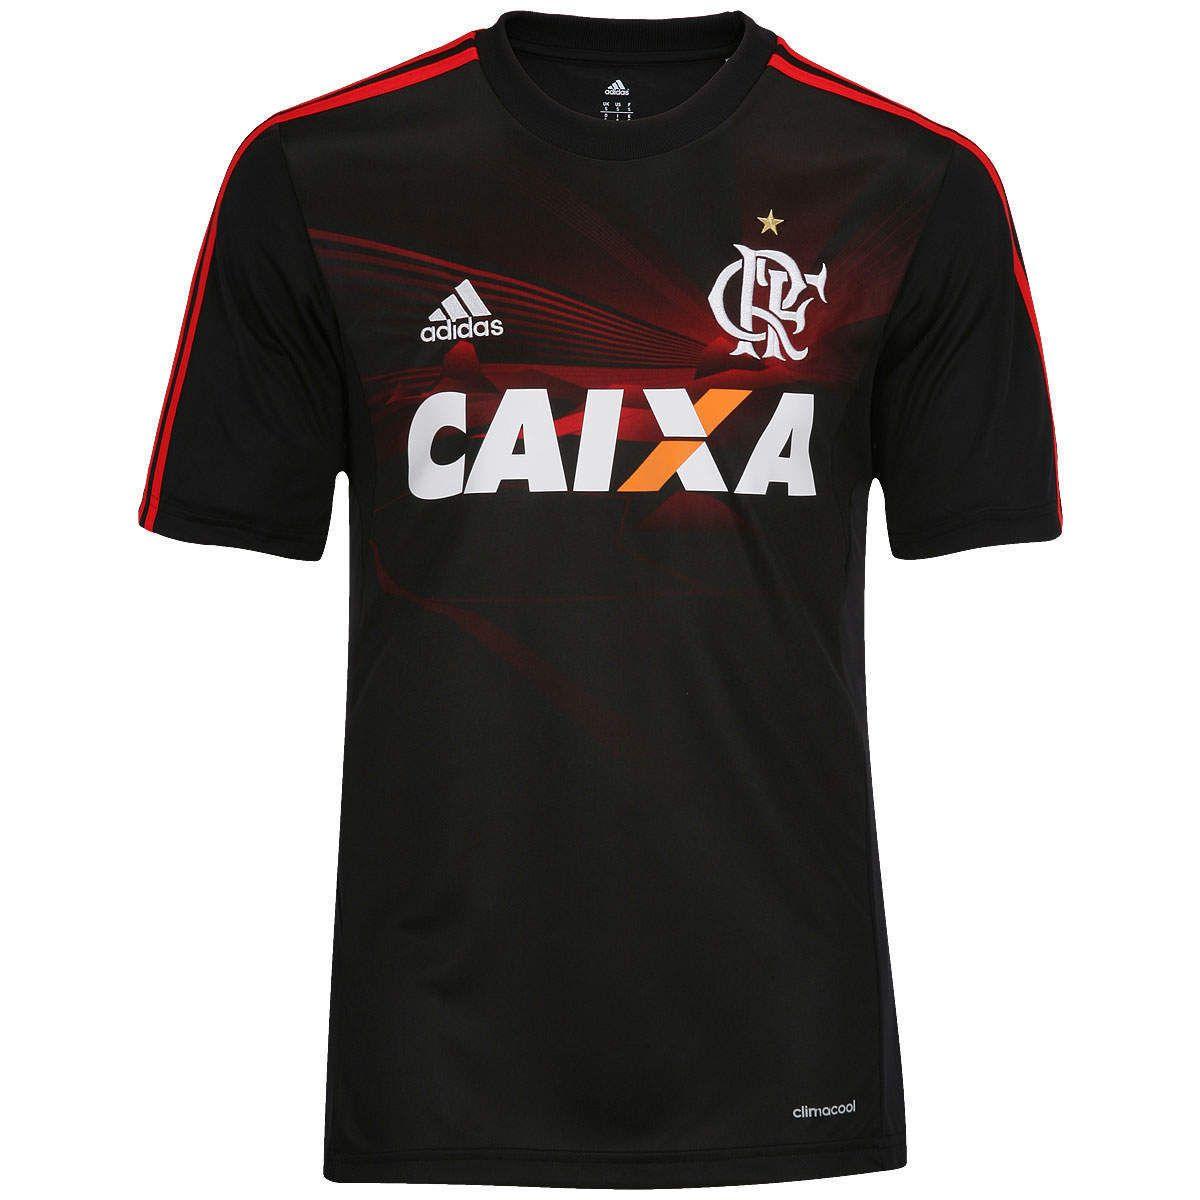 Camisa do Flamengo III 2013 s nº adidas  e3f595d7f7c08